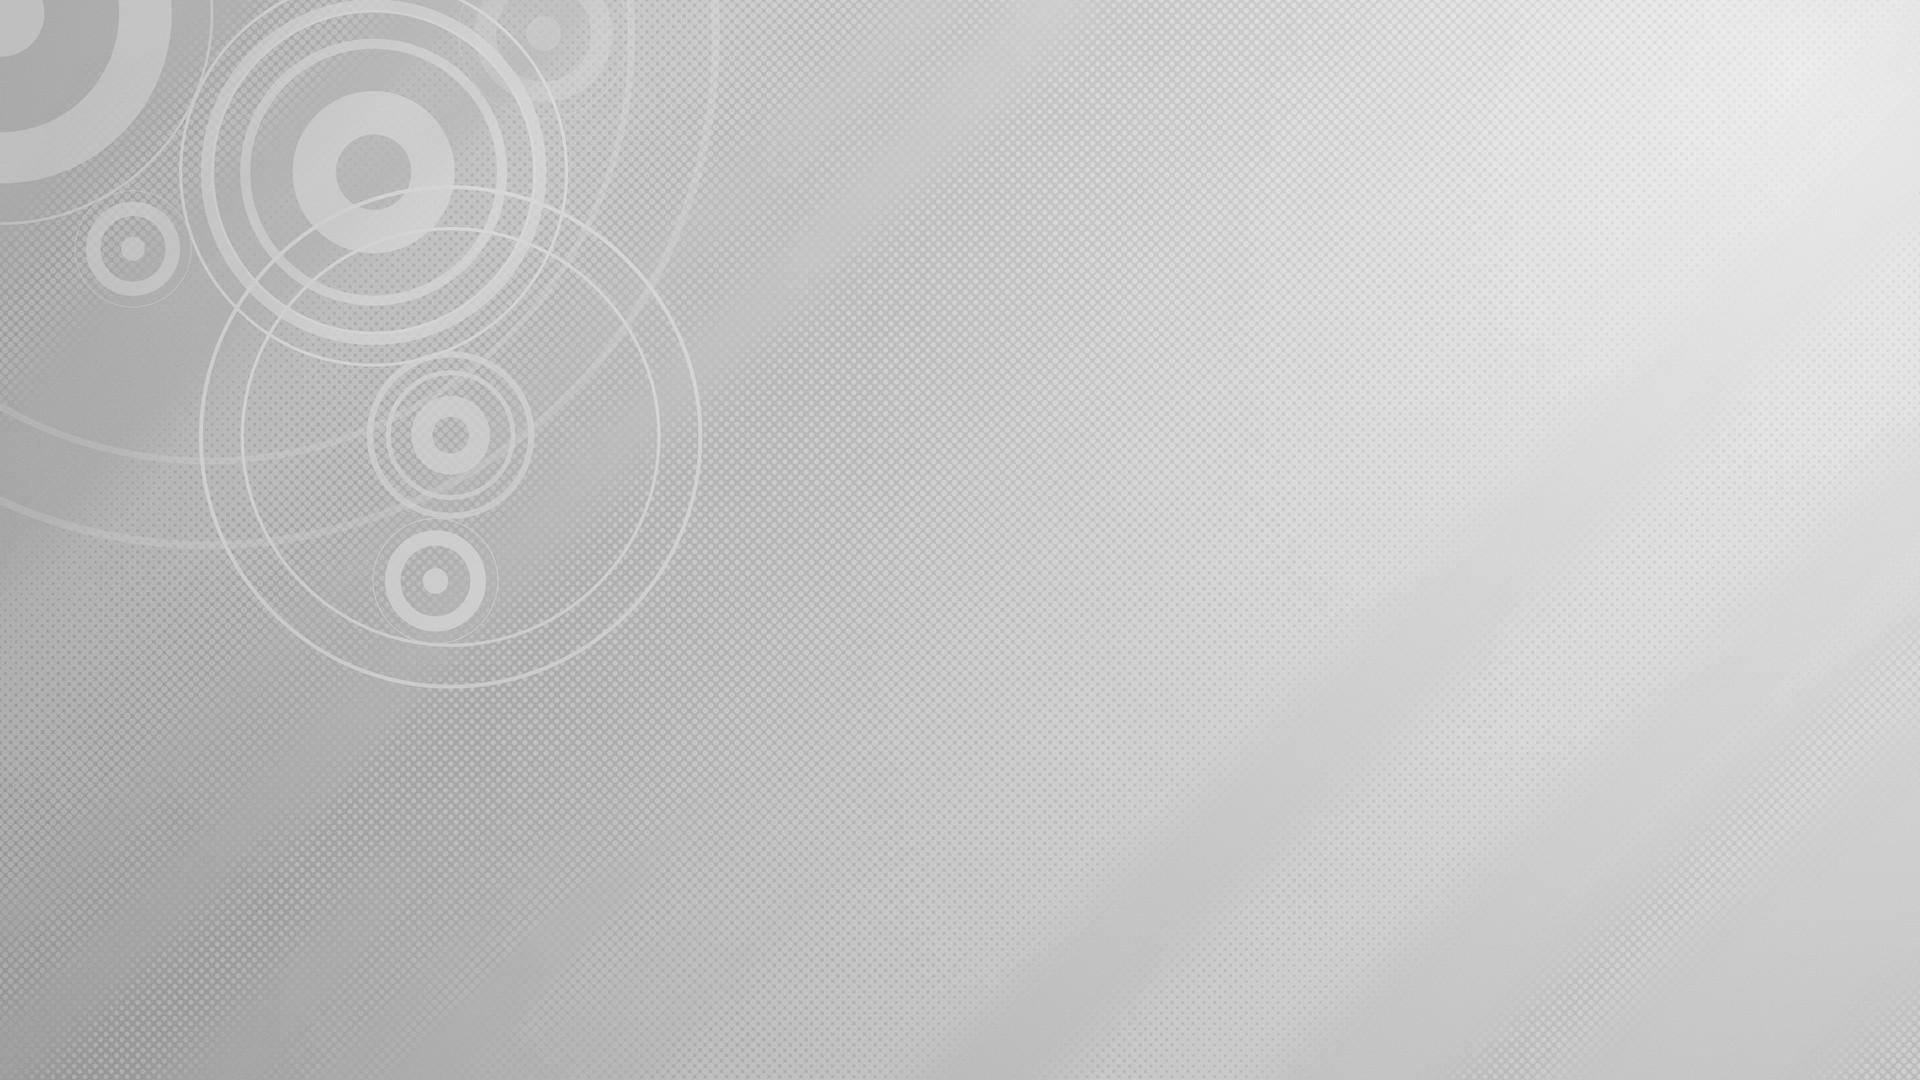 HD White Wallpaper - WallpaperSafari